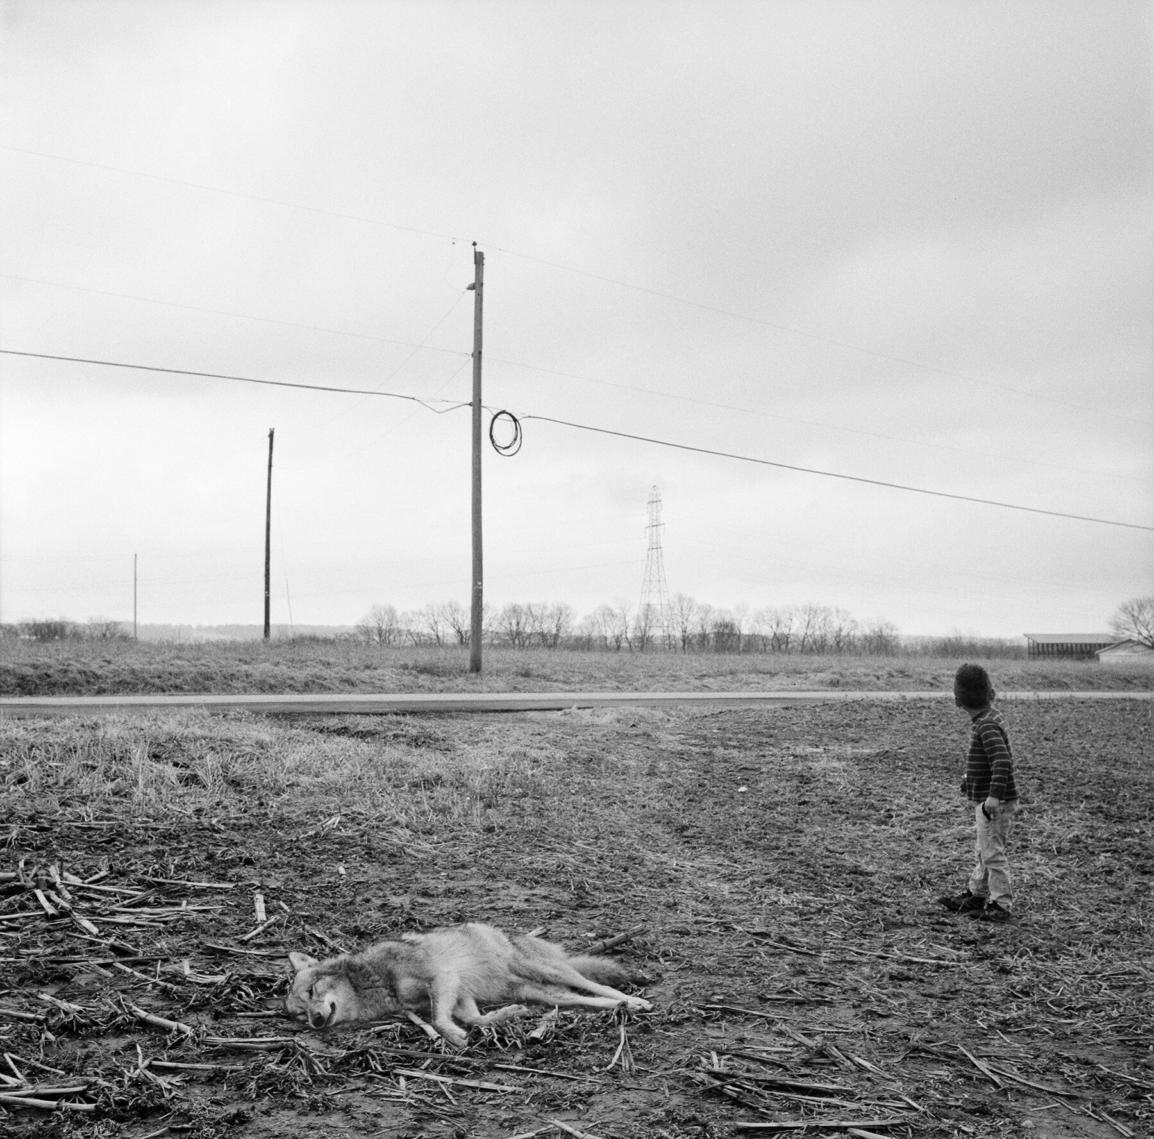 Jesse Lenz /Peter Branson